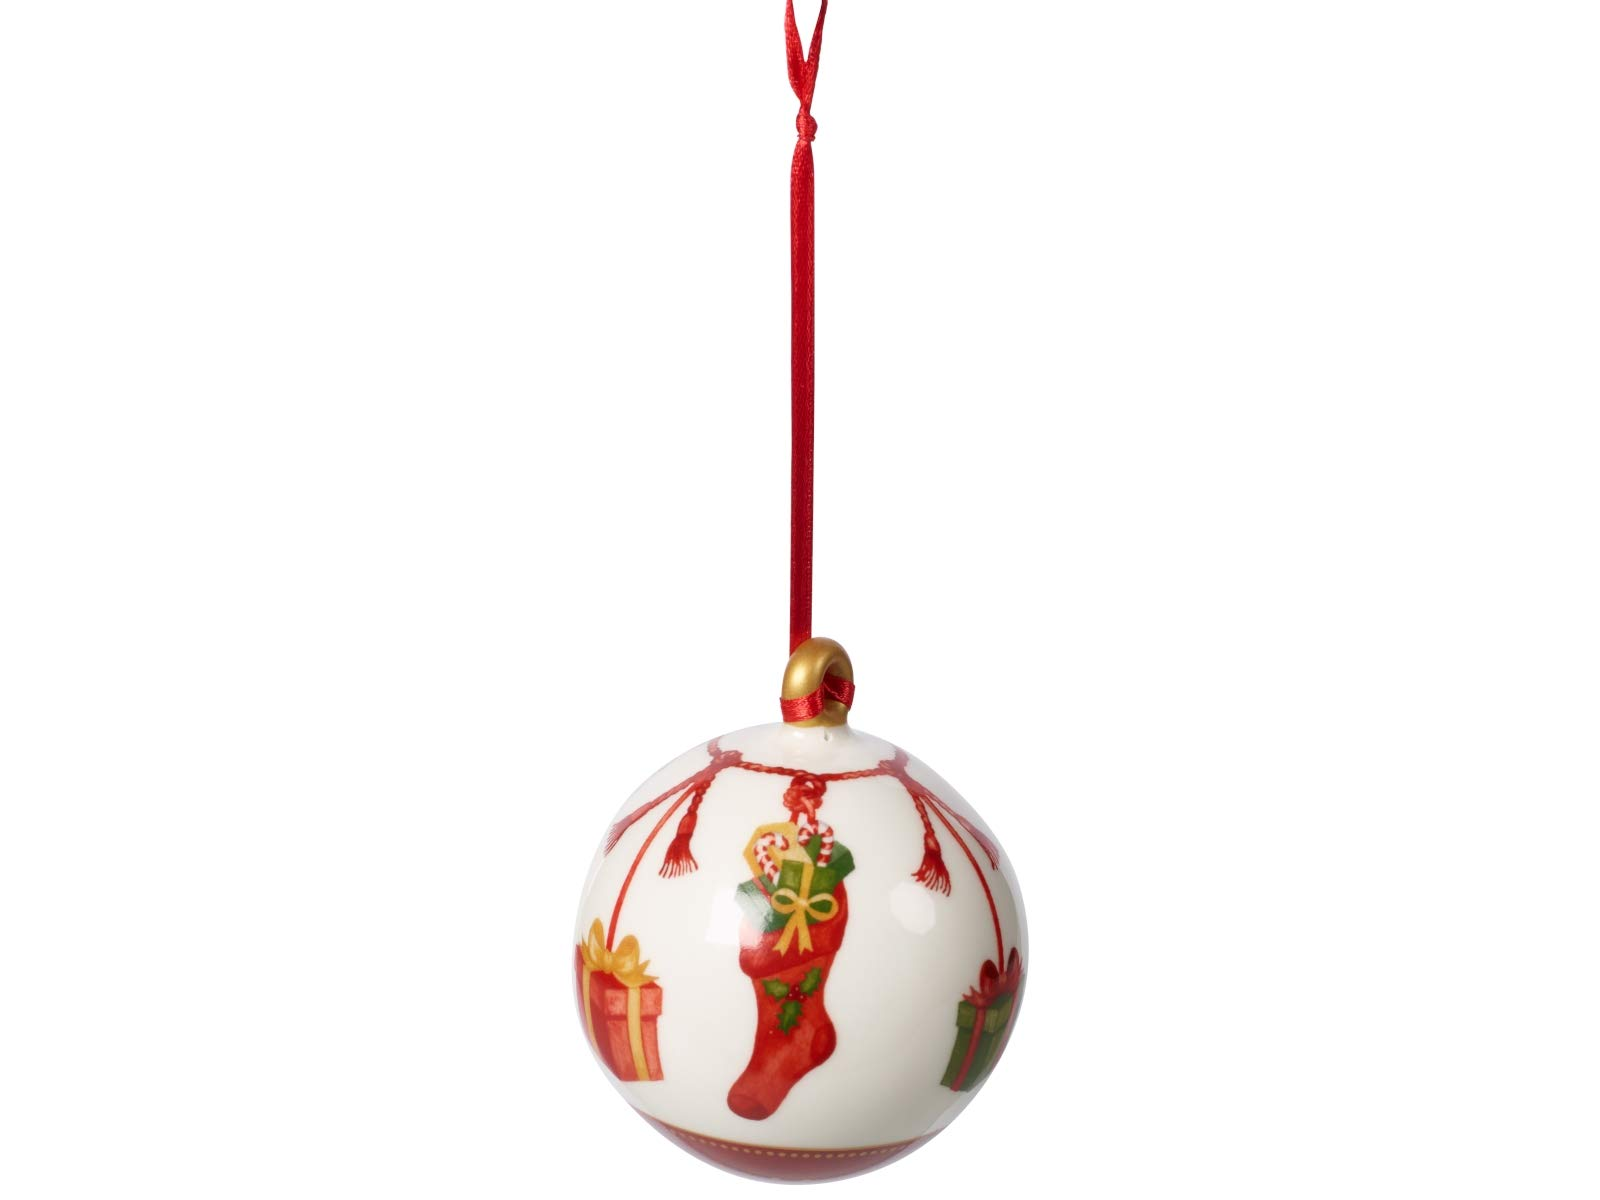 Villeroy-Boch-1486266862-Annual-Christmas-Edition-Kugel-2019-1-Stck